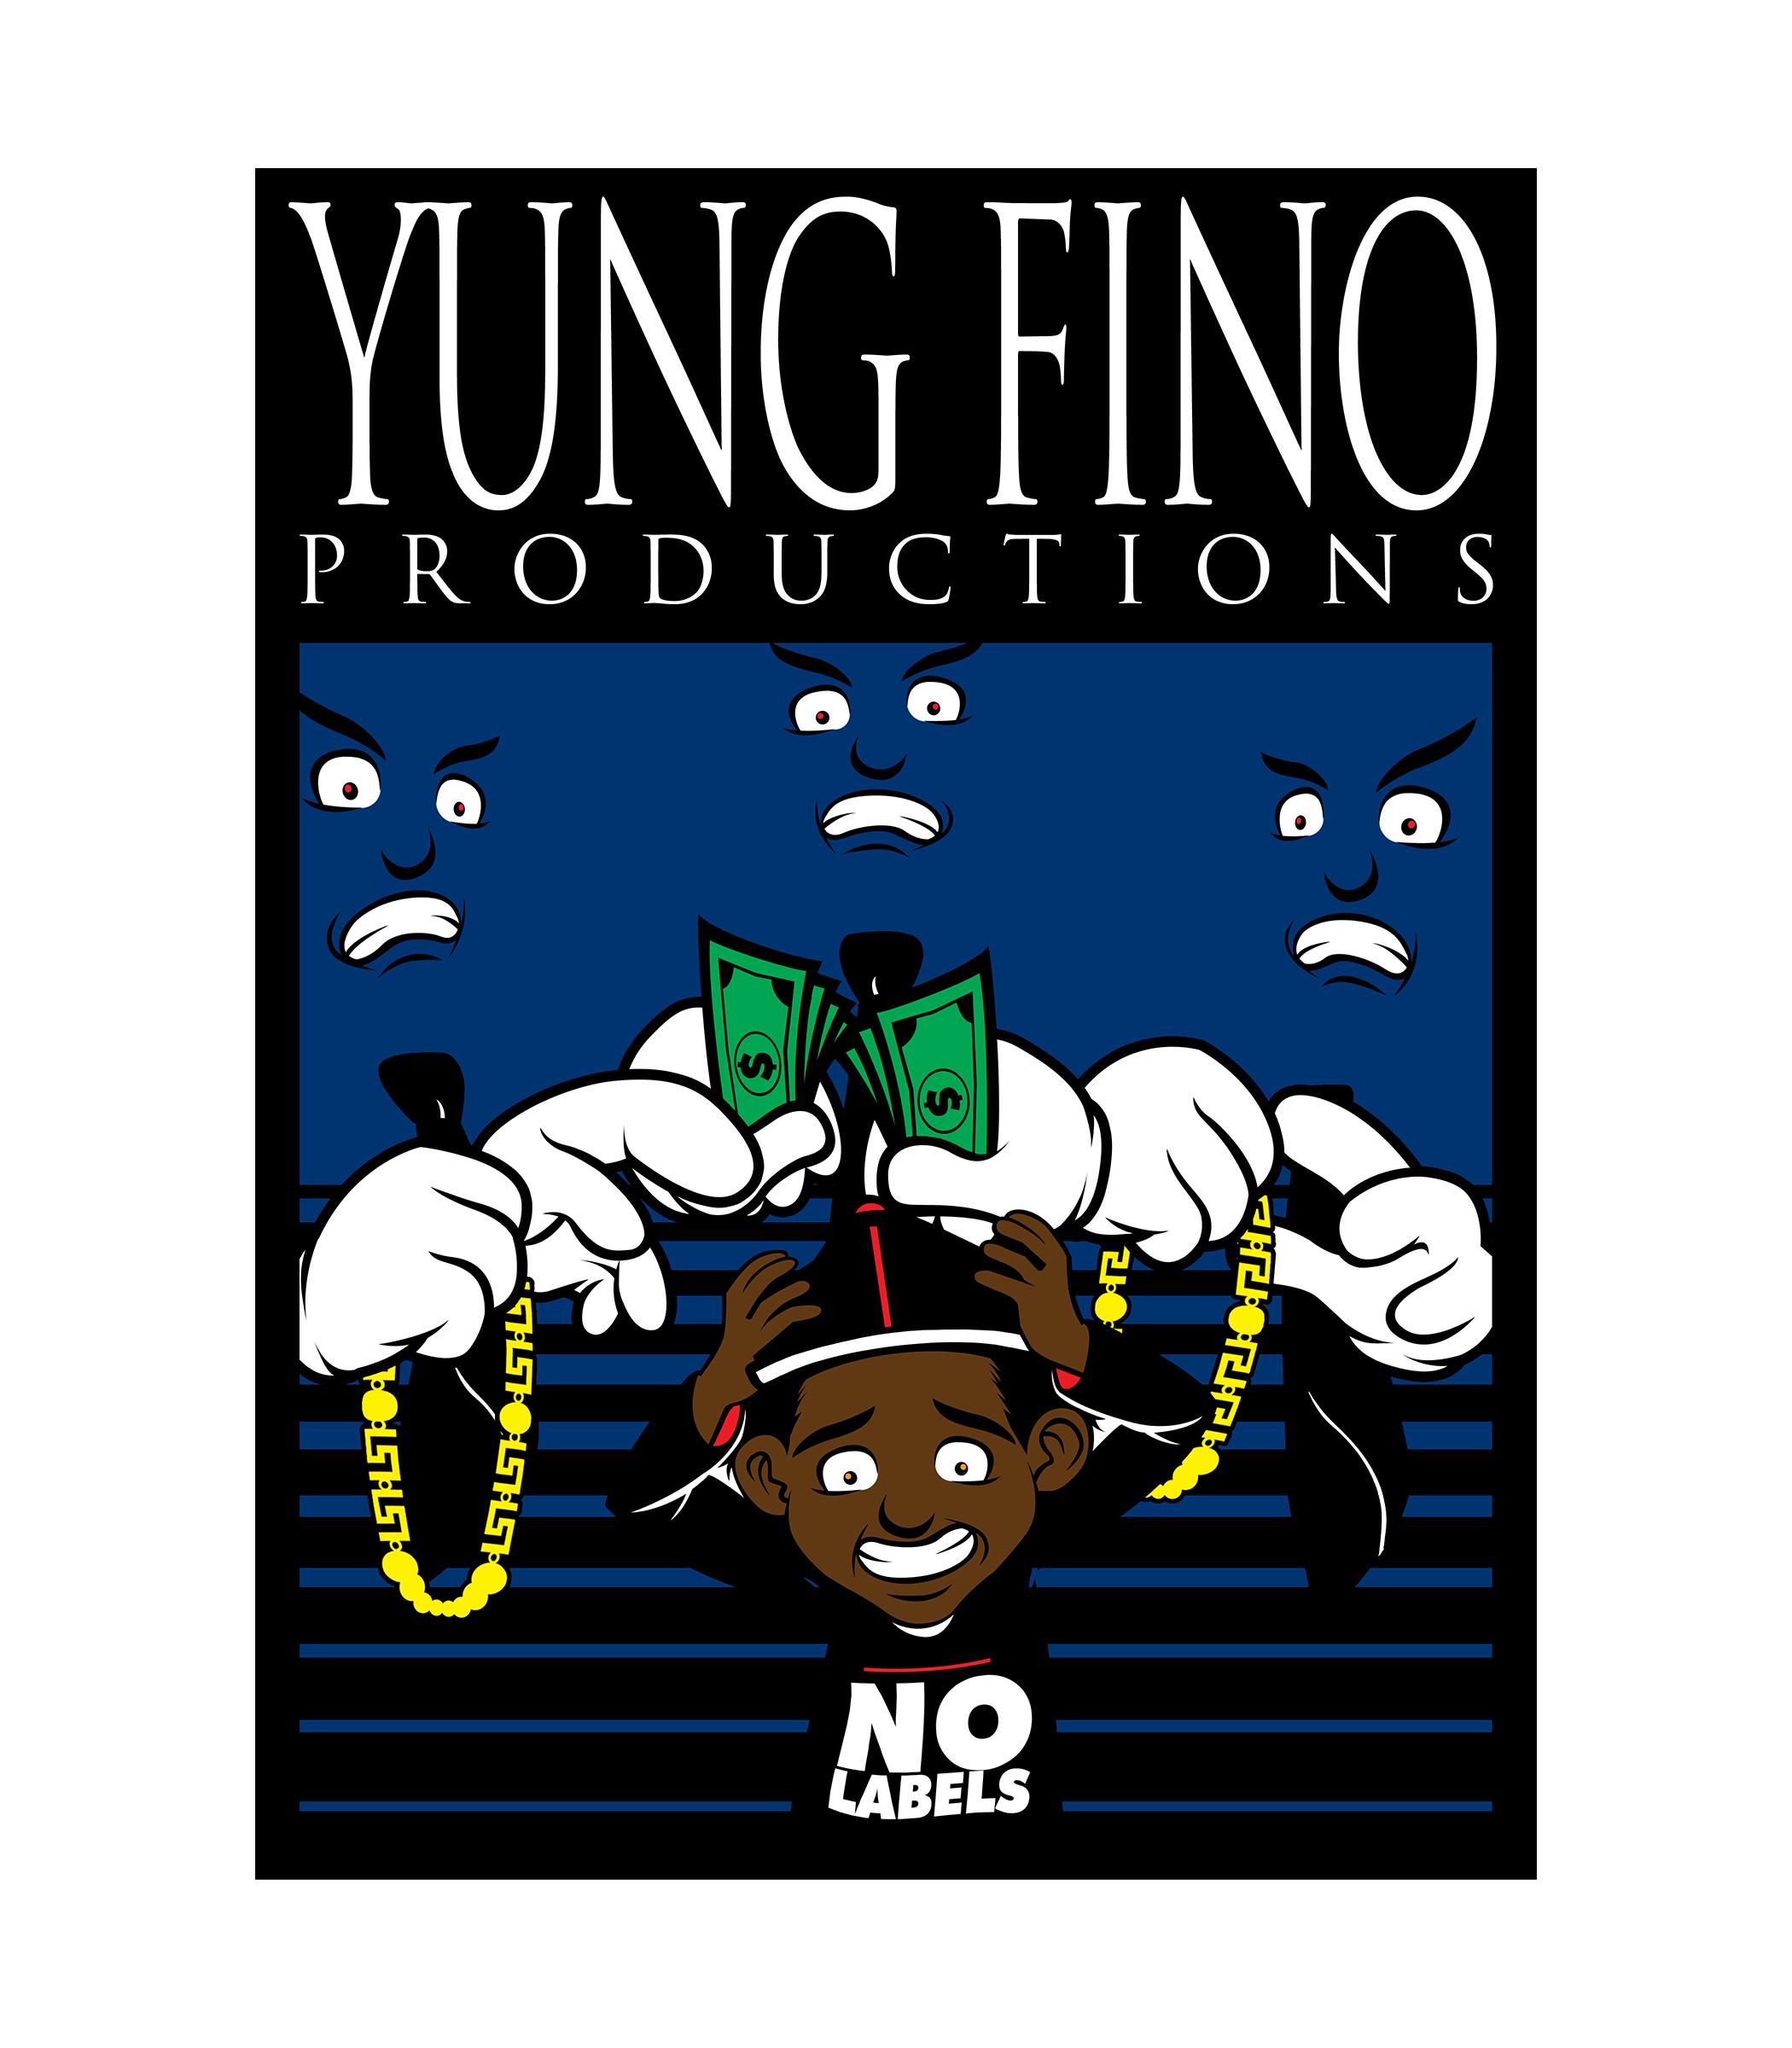 Yung Fino Productions